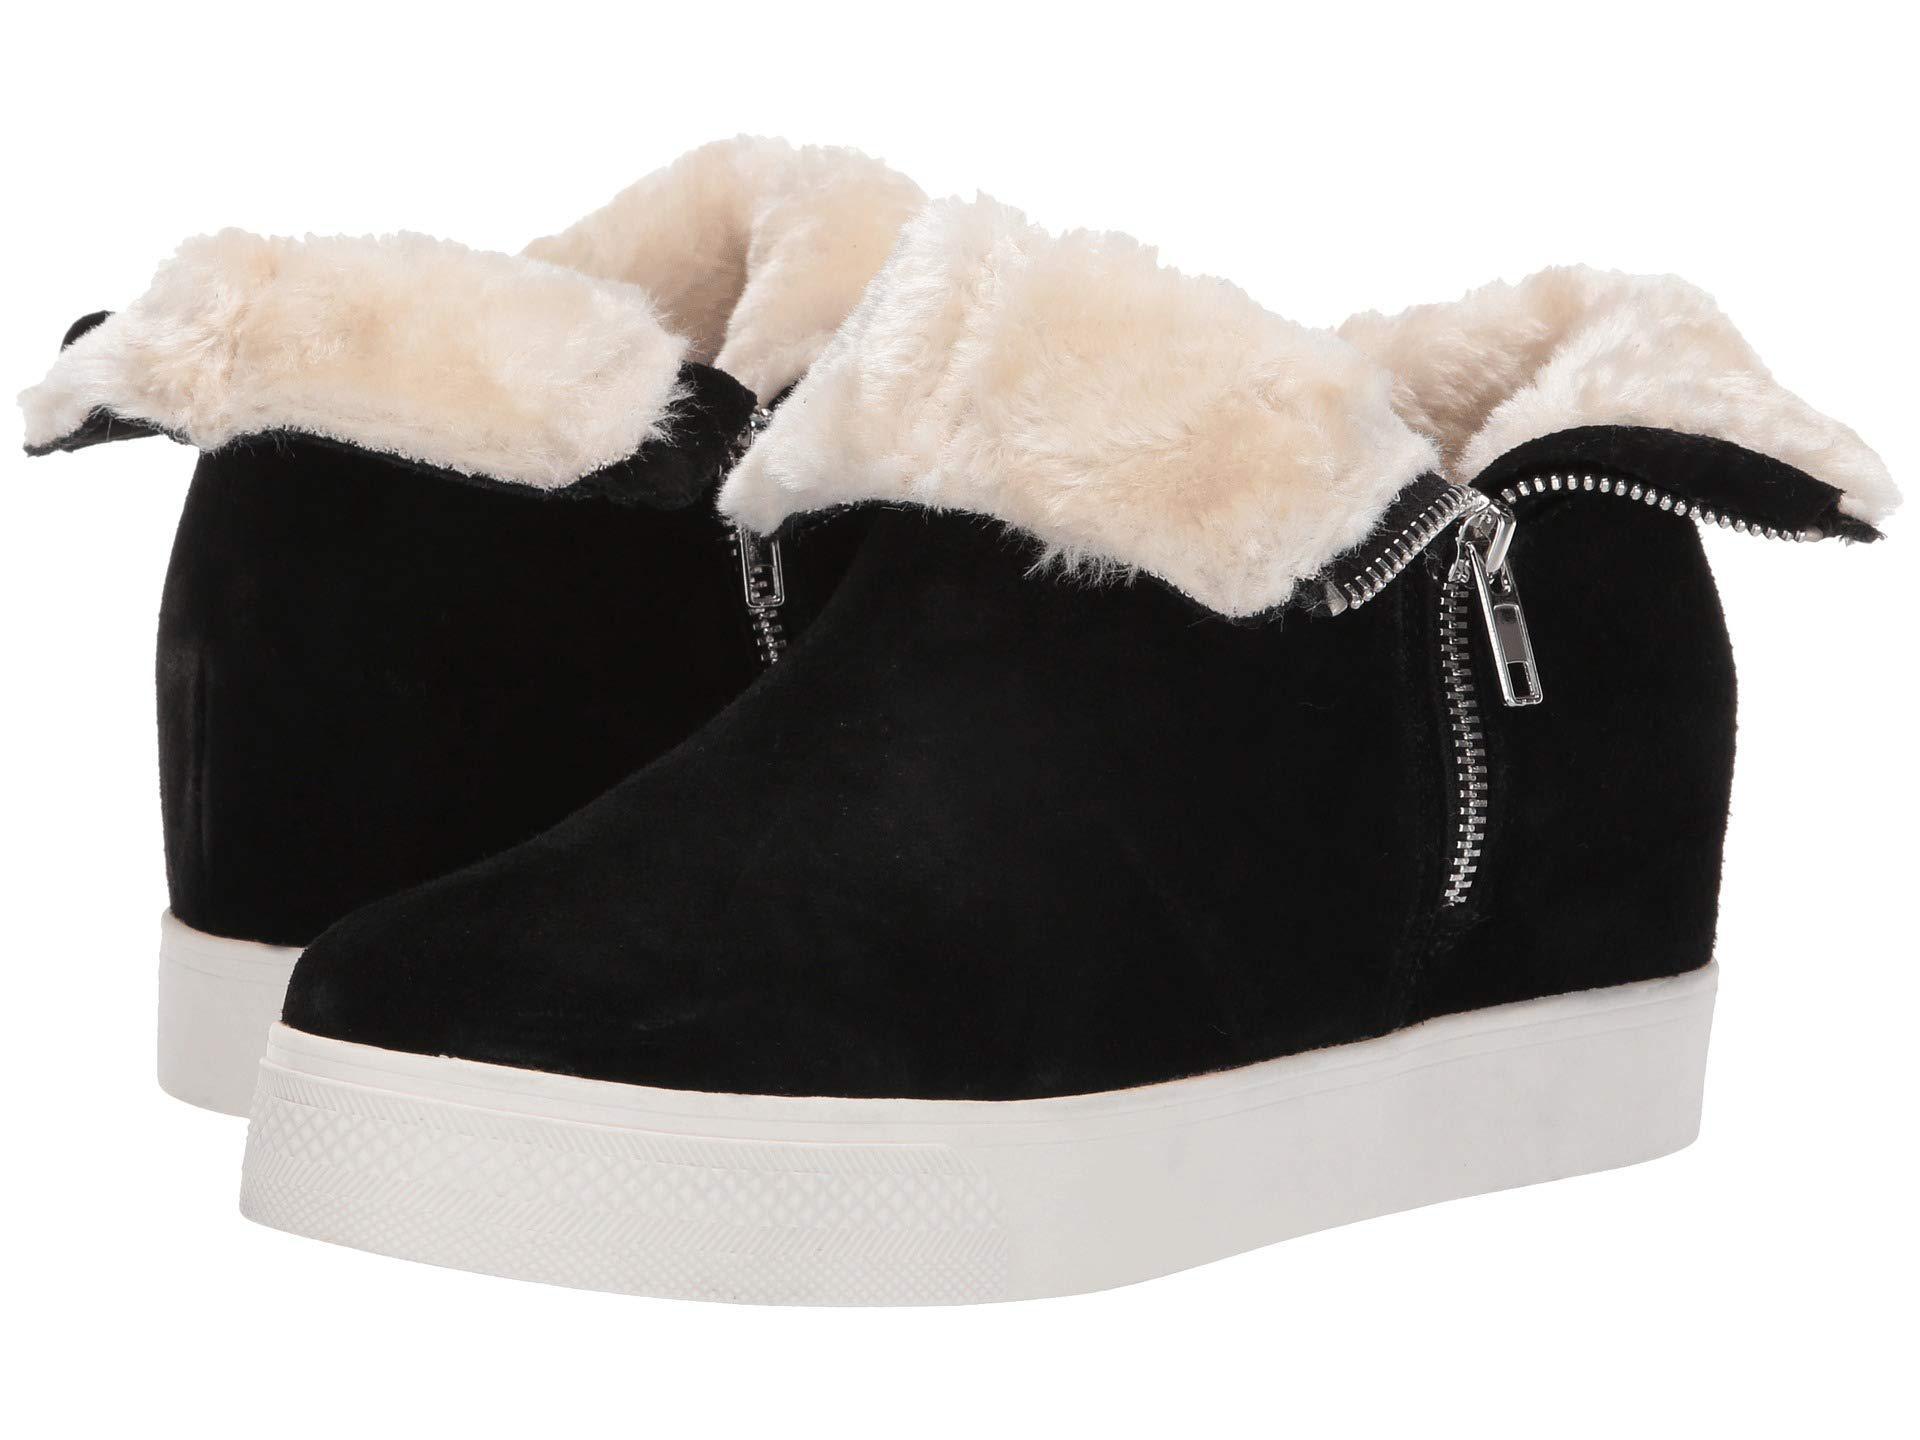 53397c4f25c4 Lyst - Steve Madden Wanda Wedge Sneaker (black Suede) Women s Wedge ...